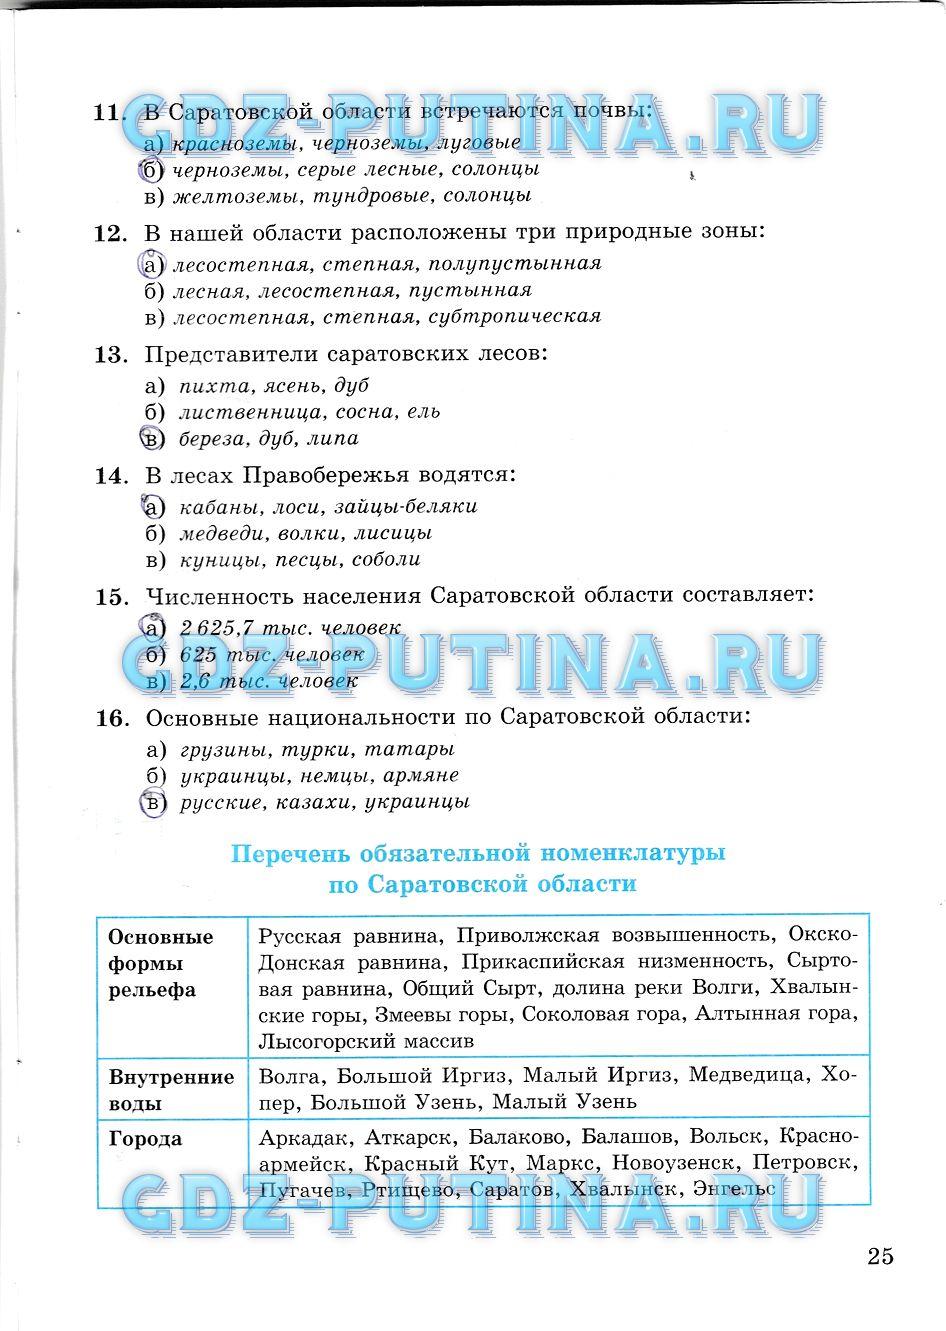 краеведенью класс 7 решебник по за